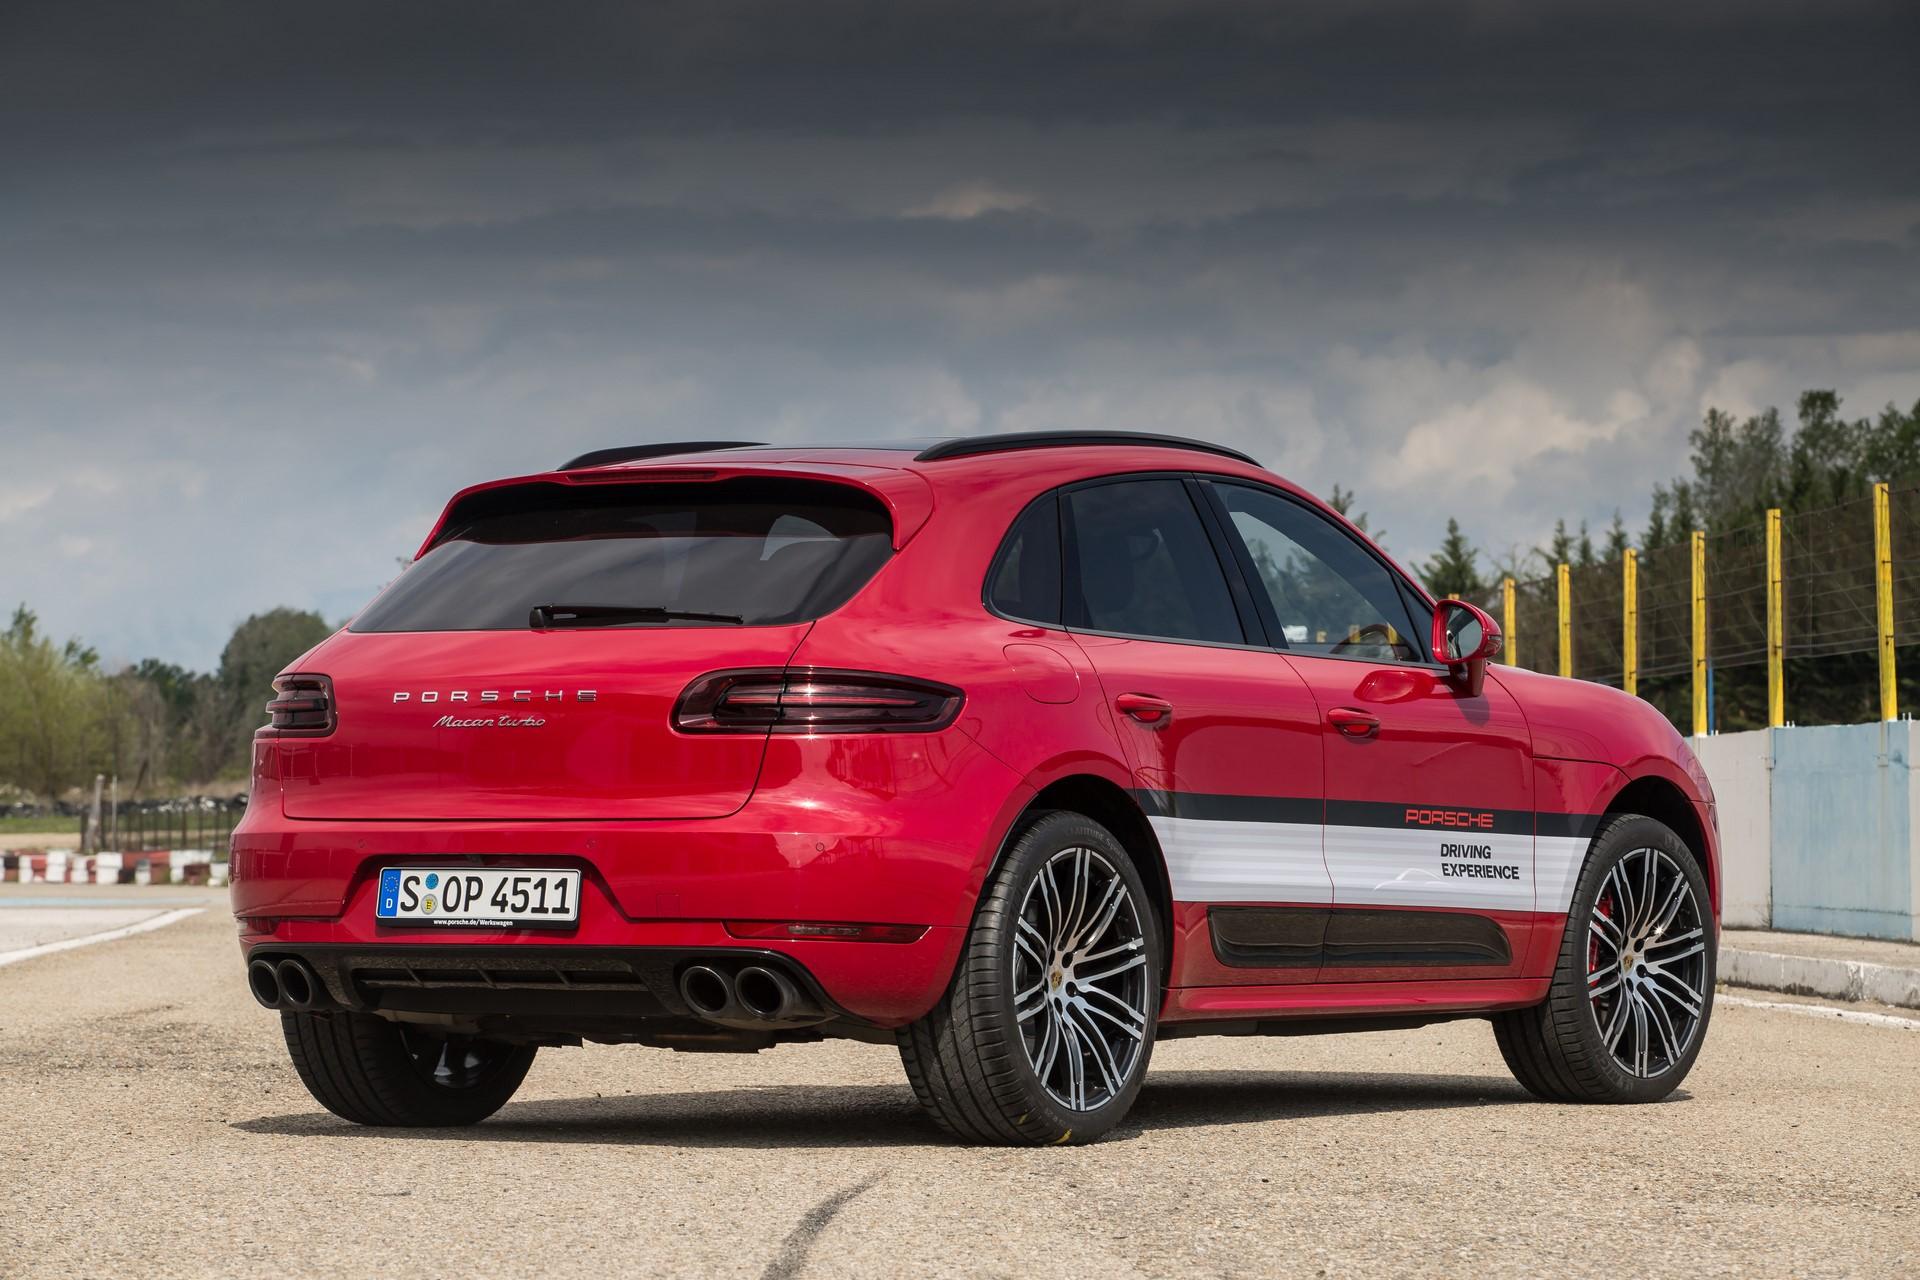 Porsche Driving Experience 2017 Serres (15)